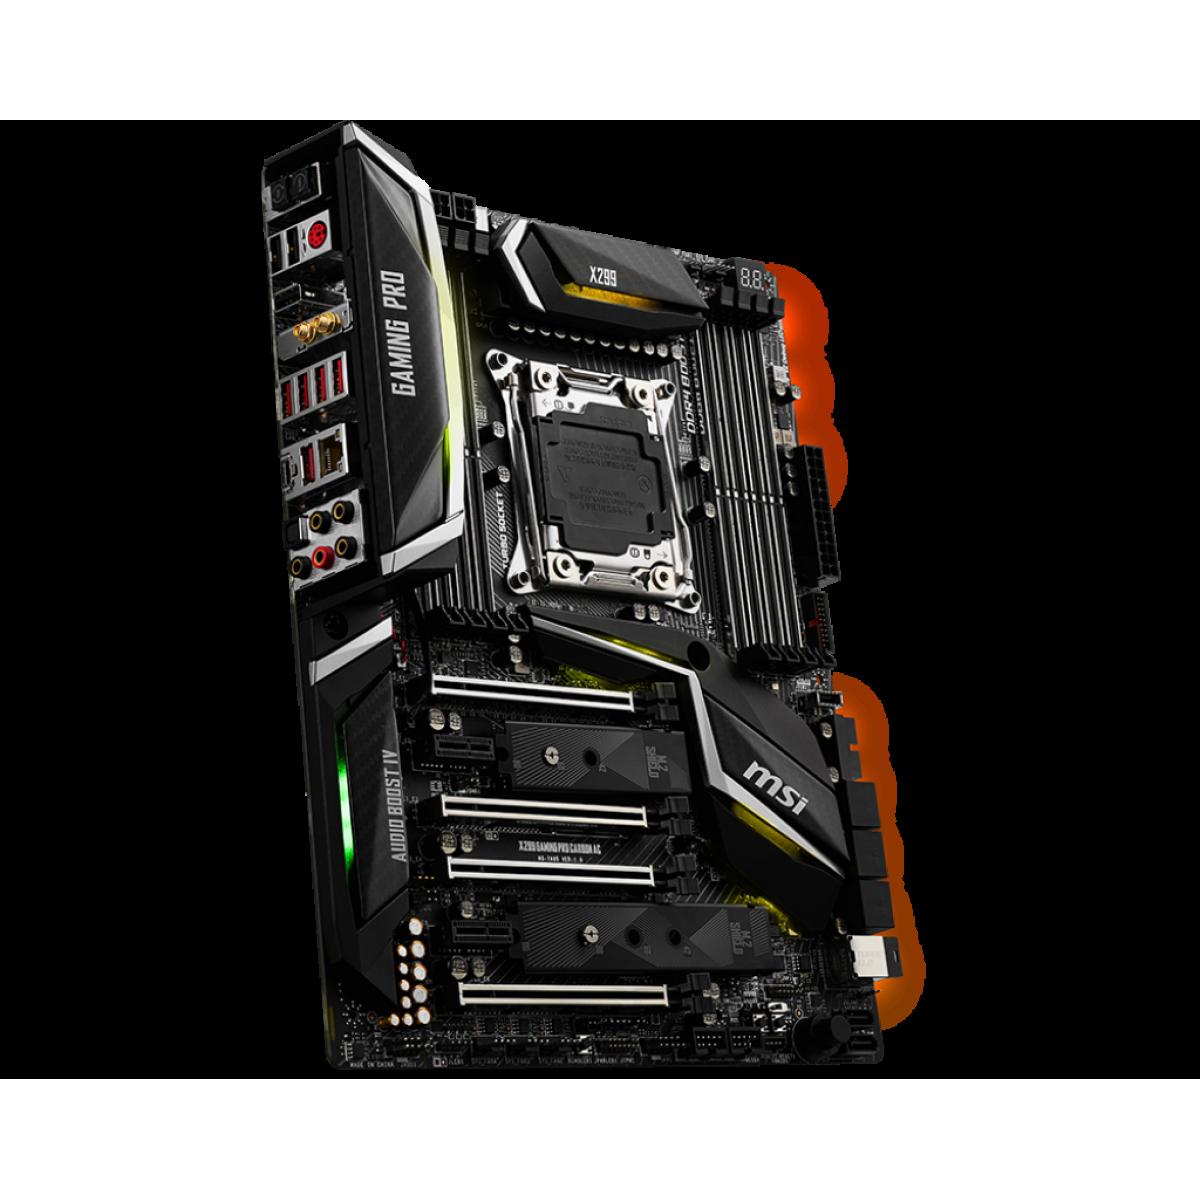 Placa Mãe MSI X299 GAMING PRO CARBON AC, Chipset X299, Intel LGA 2066, ATX, DDR4